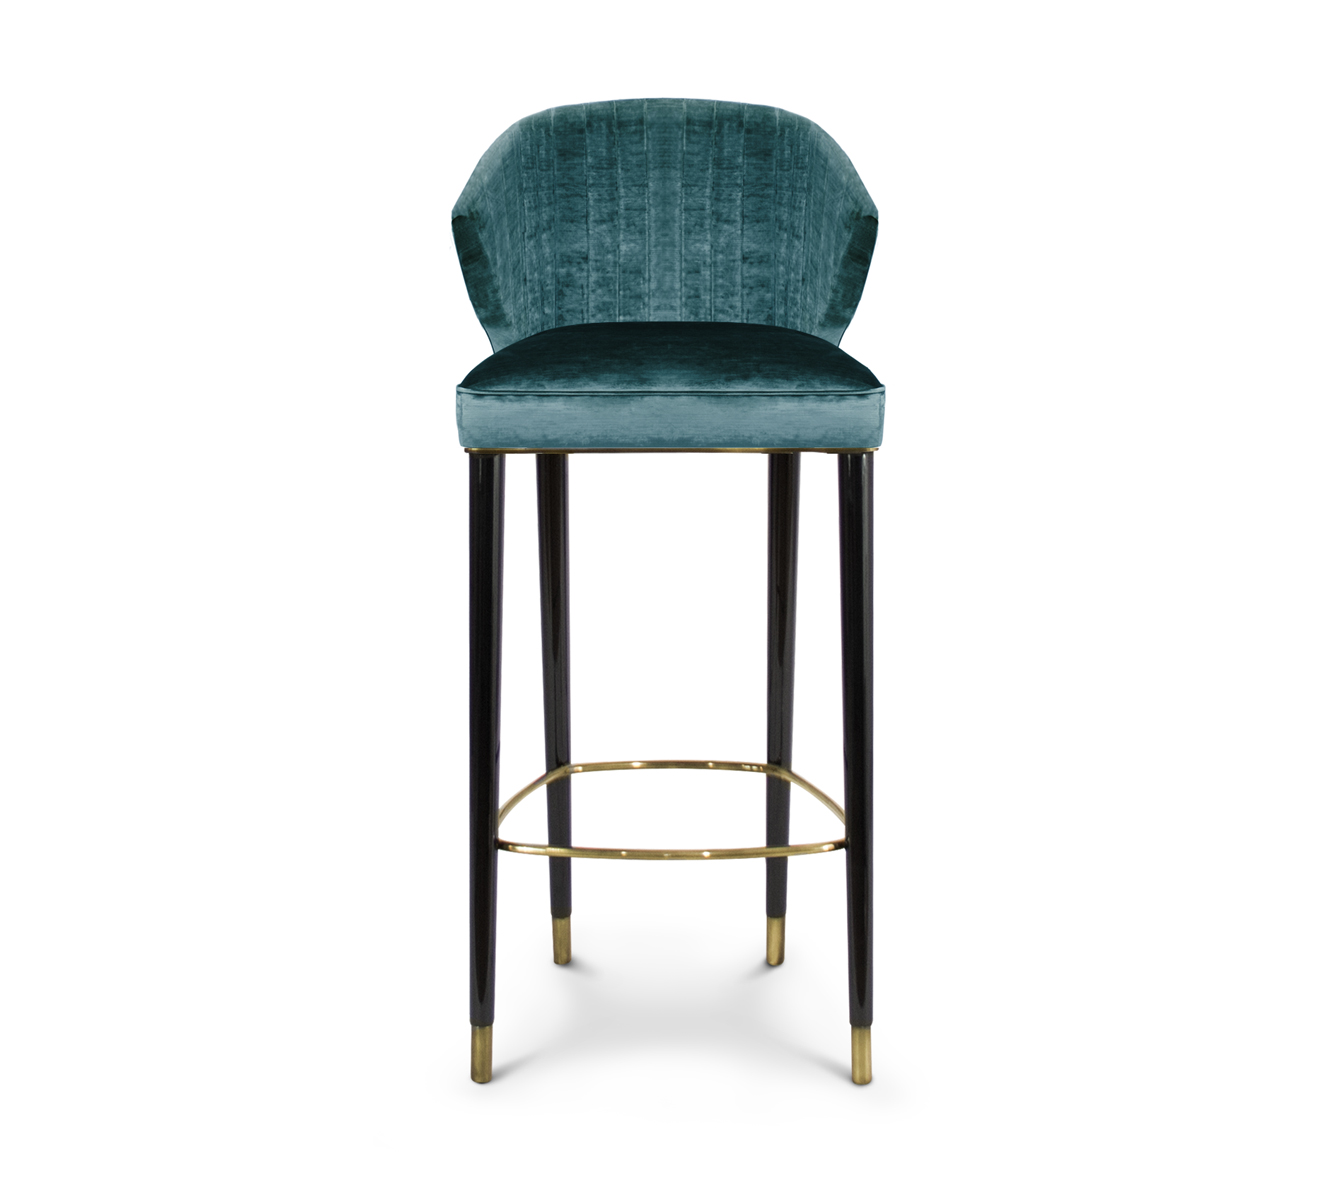 bar stool chair design target outdoor chairs black nuka by brabbu demorais international